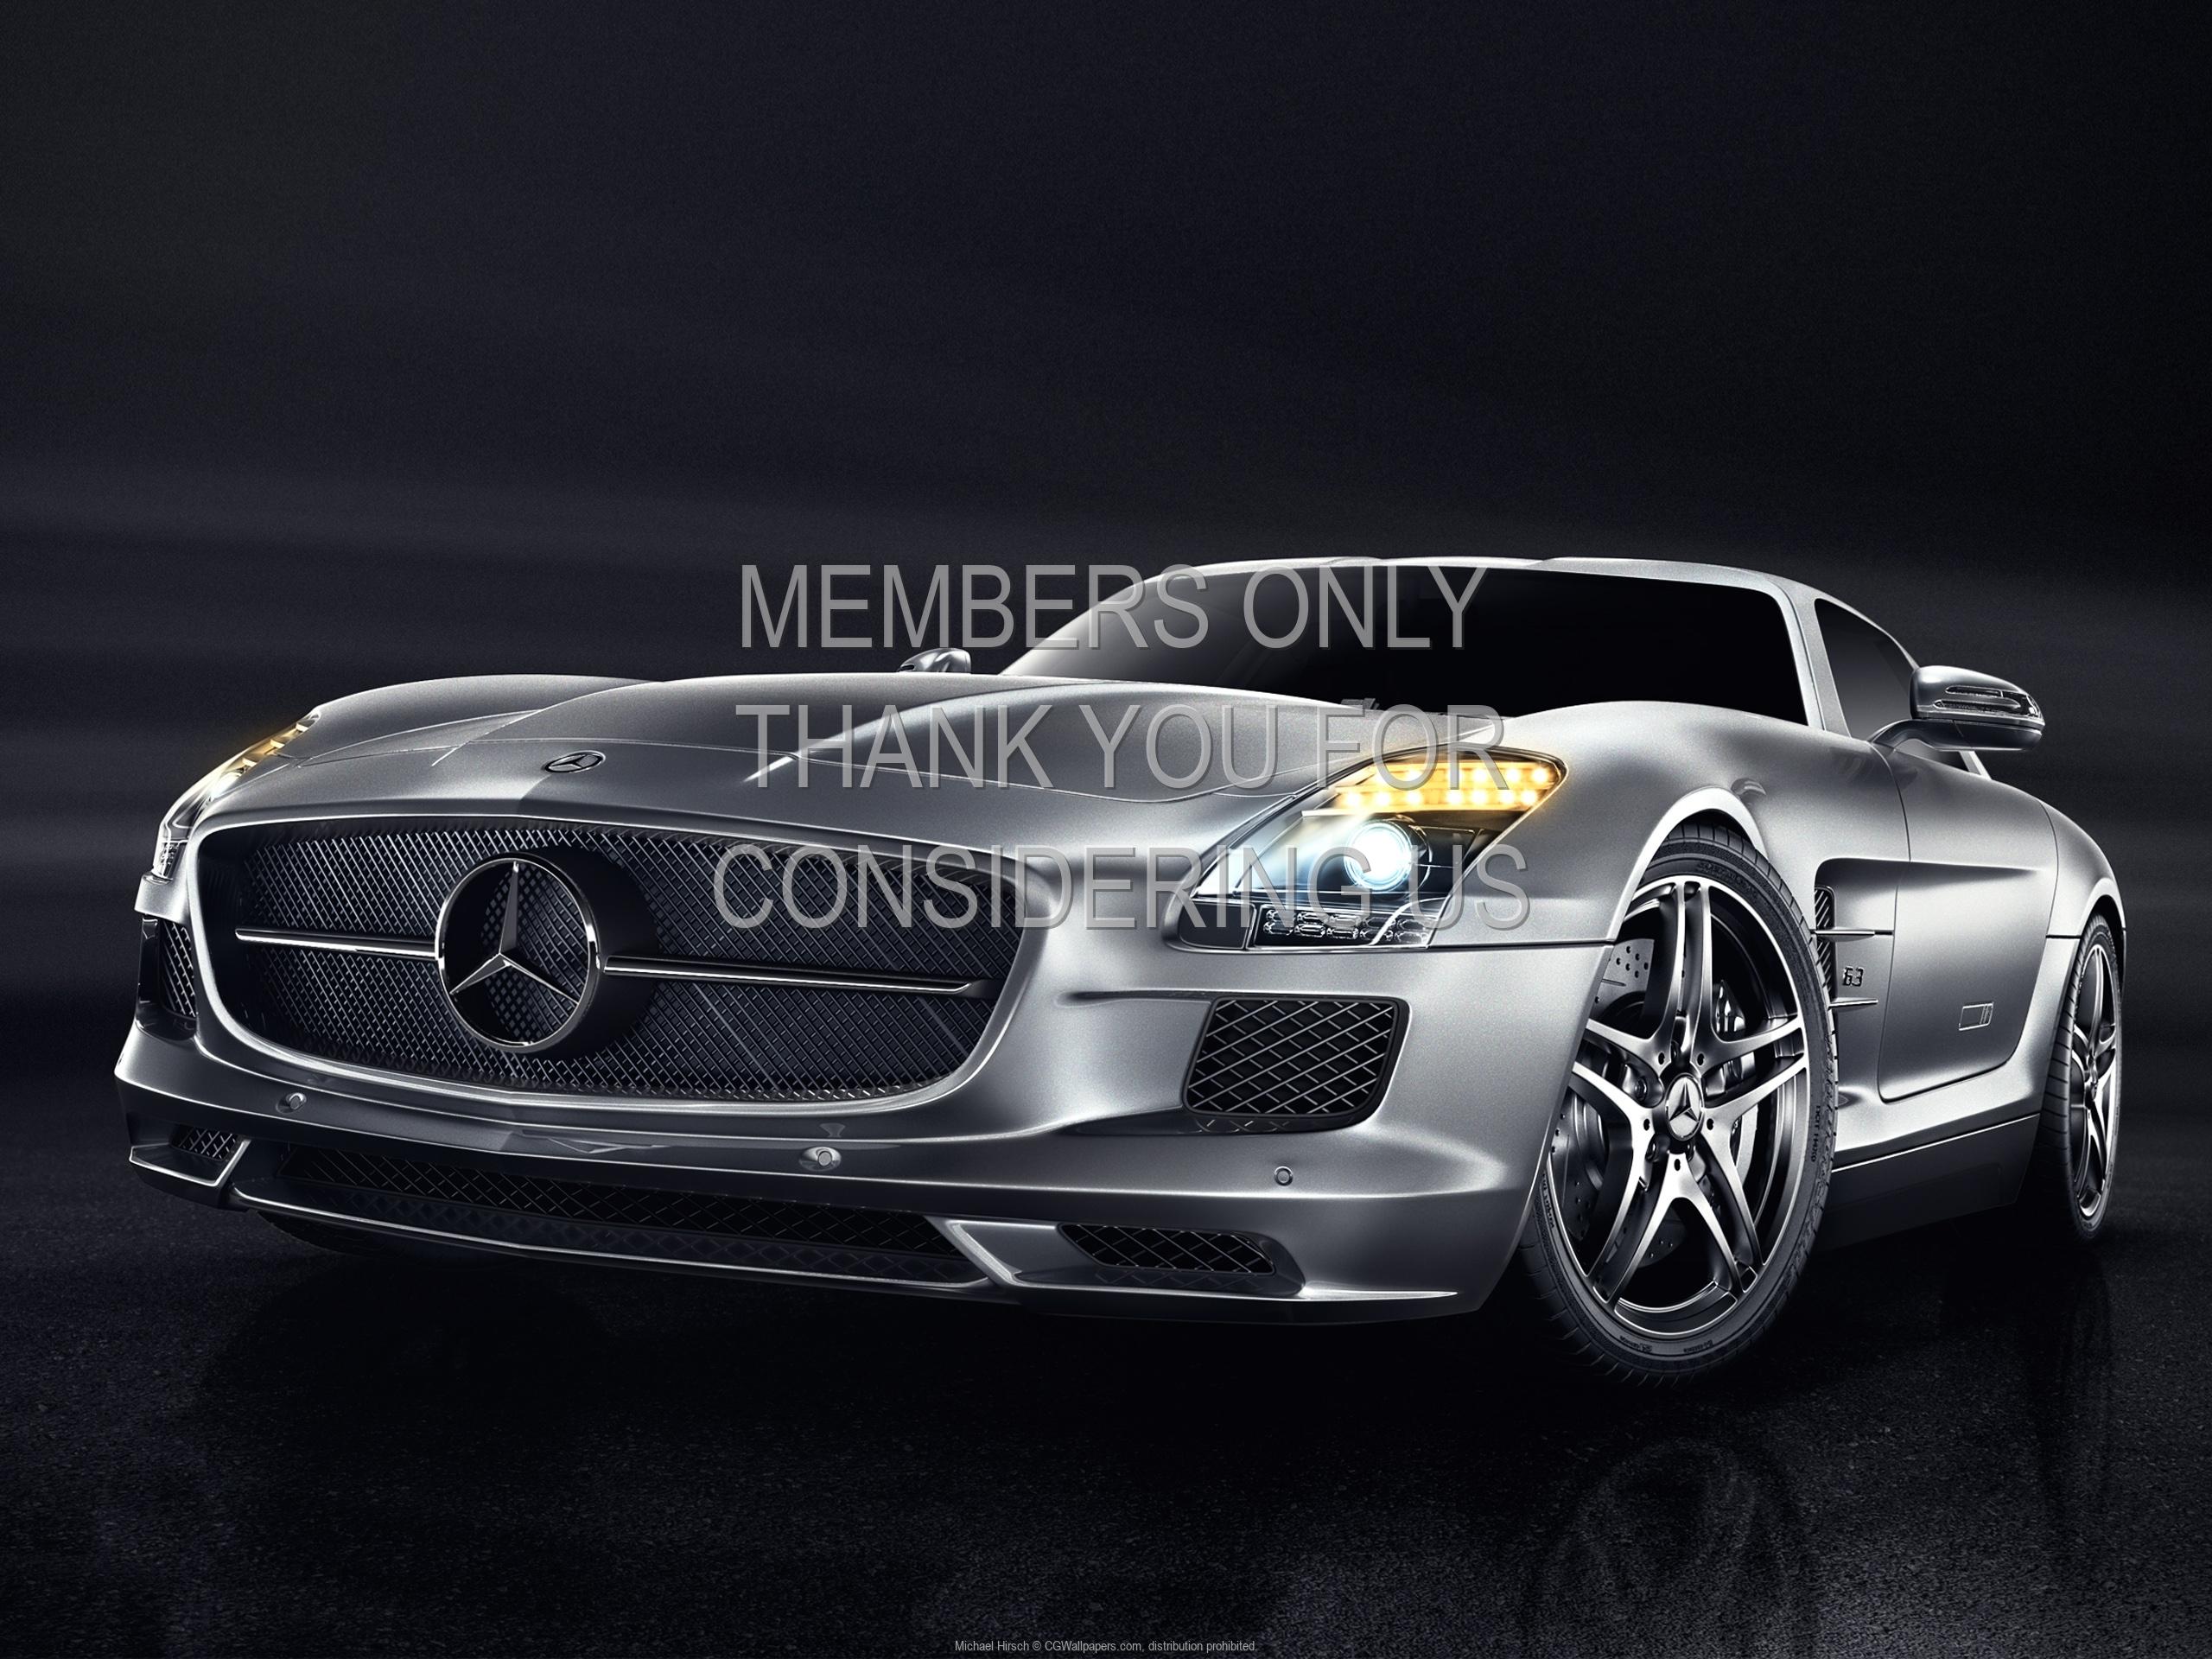 Michael Hirsch Wallpaper Mercedes Sls Amg 1080p Horizontal